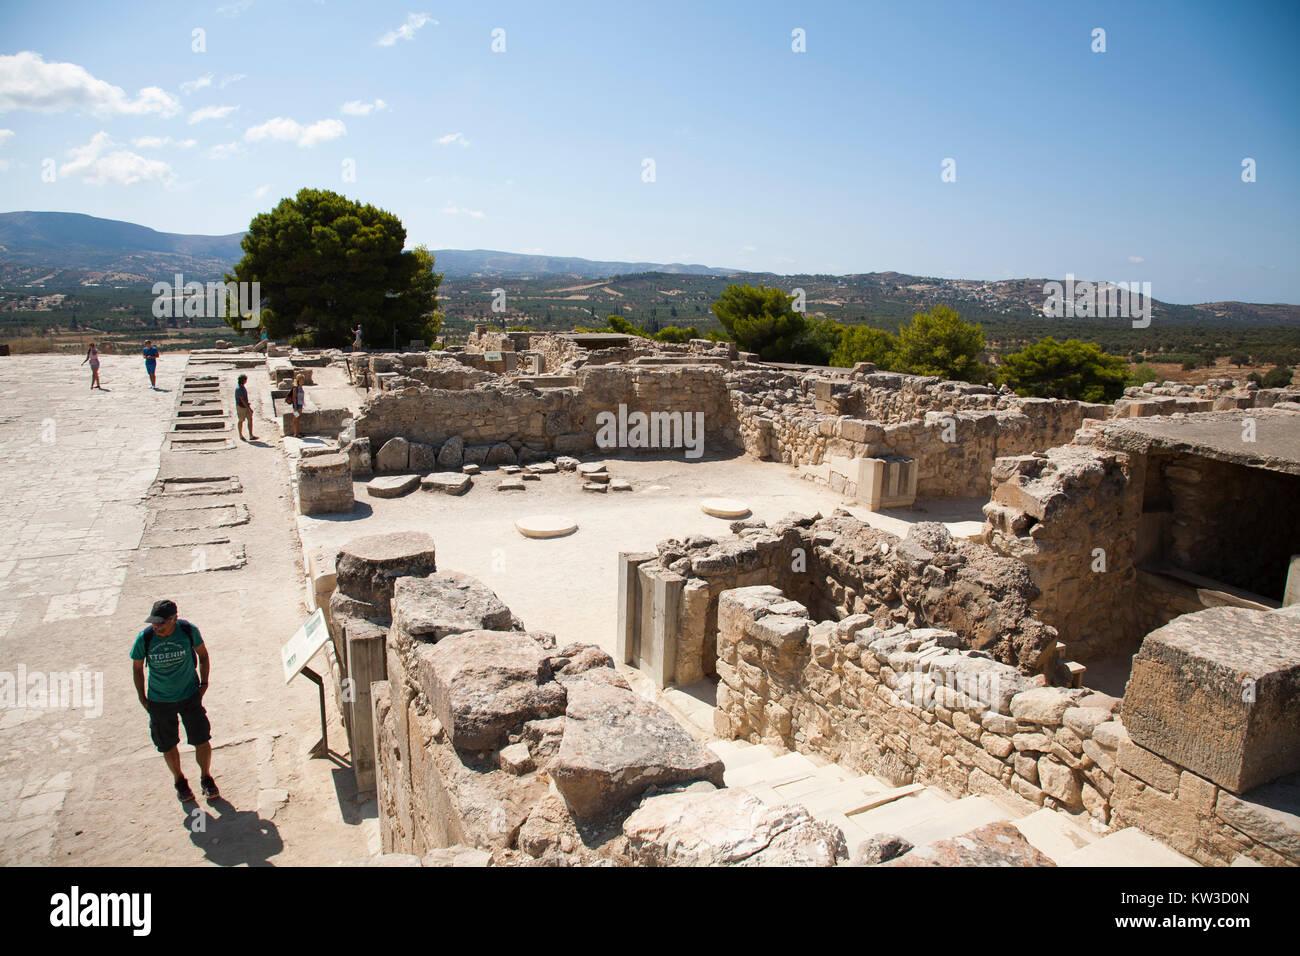 Central courtyard and area, Festos, archeological area, Crete island, Greece, Europe Stock Photo